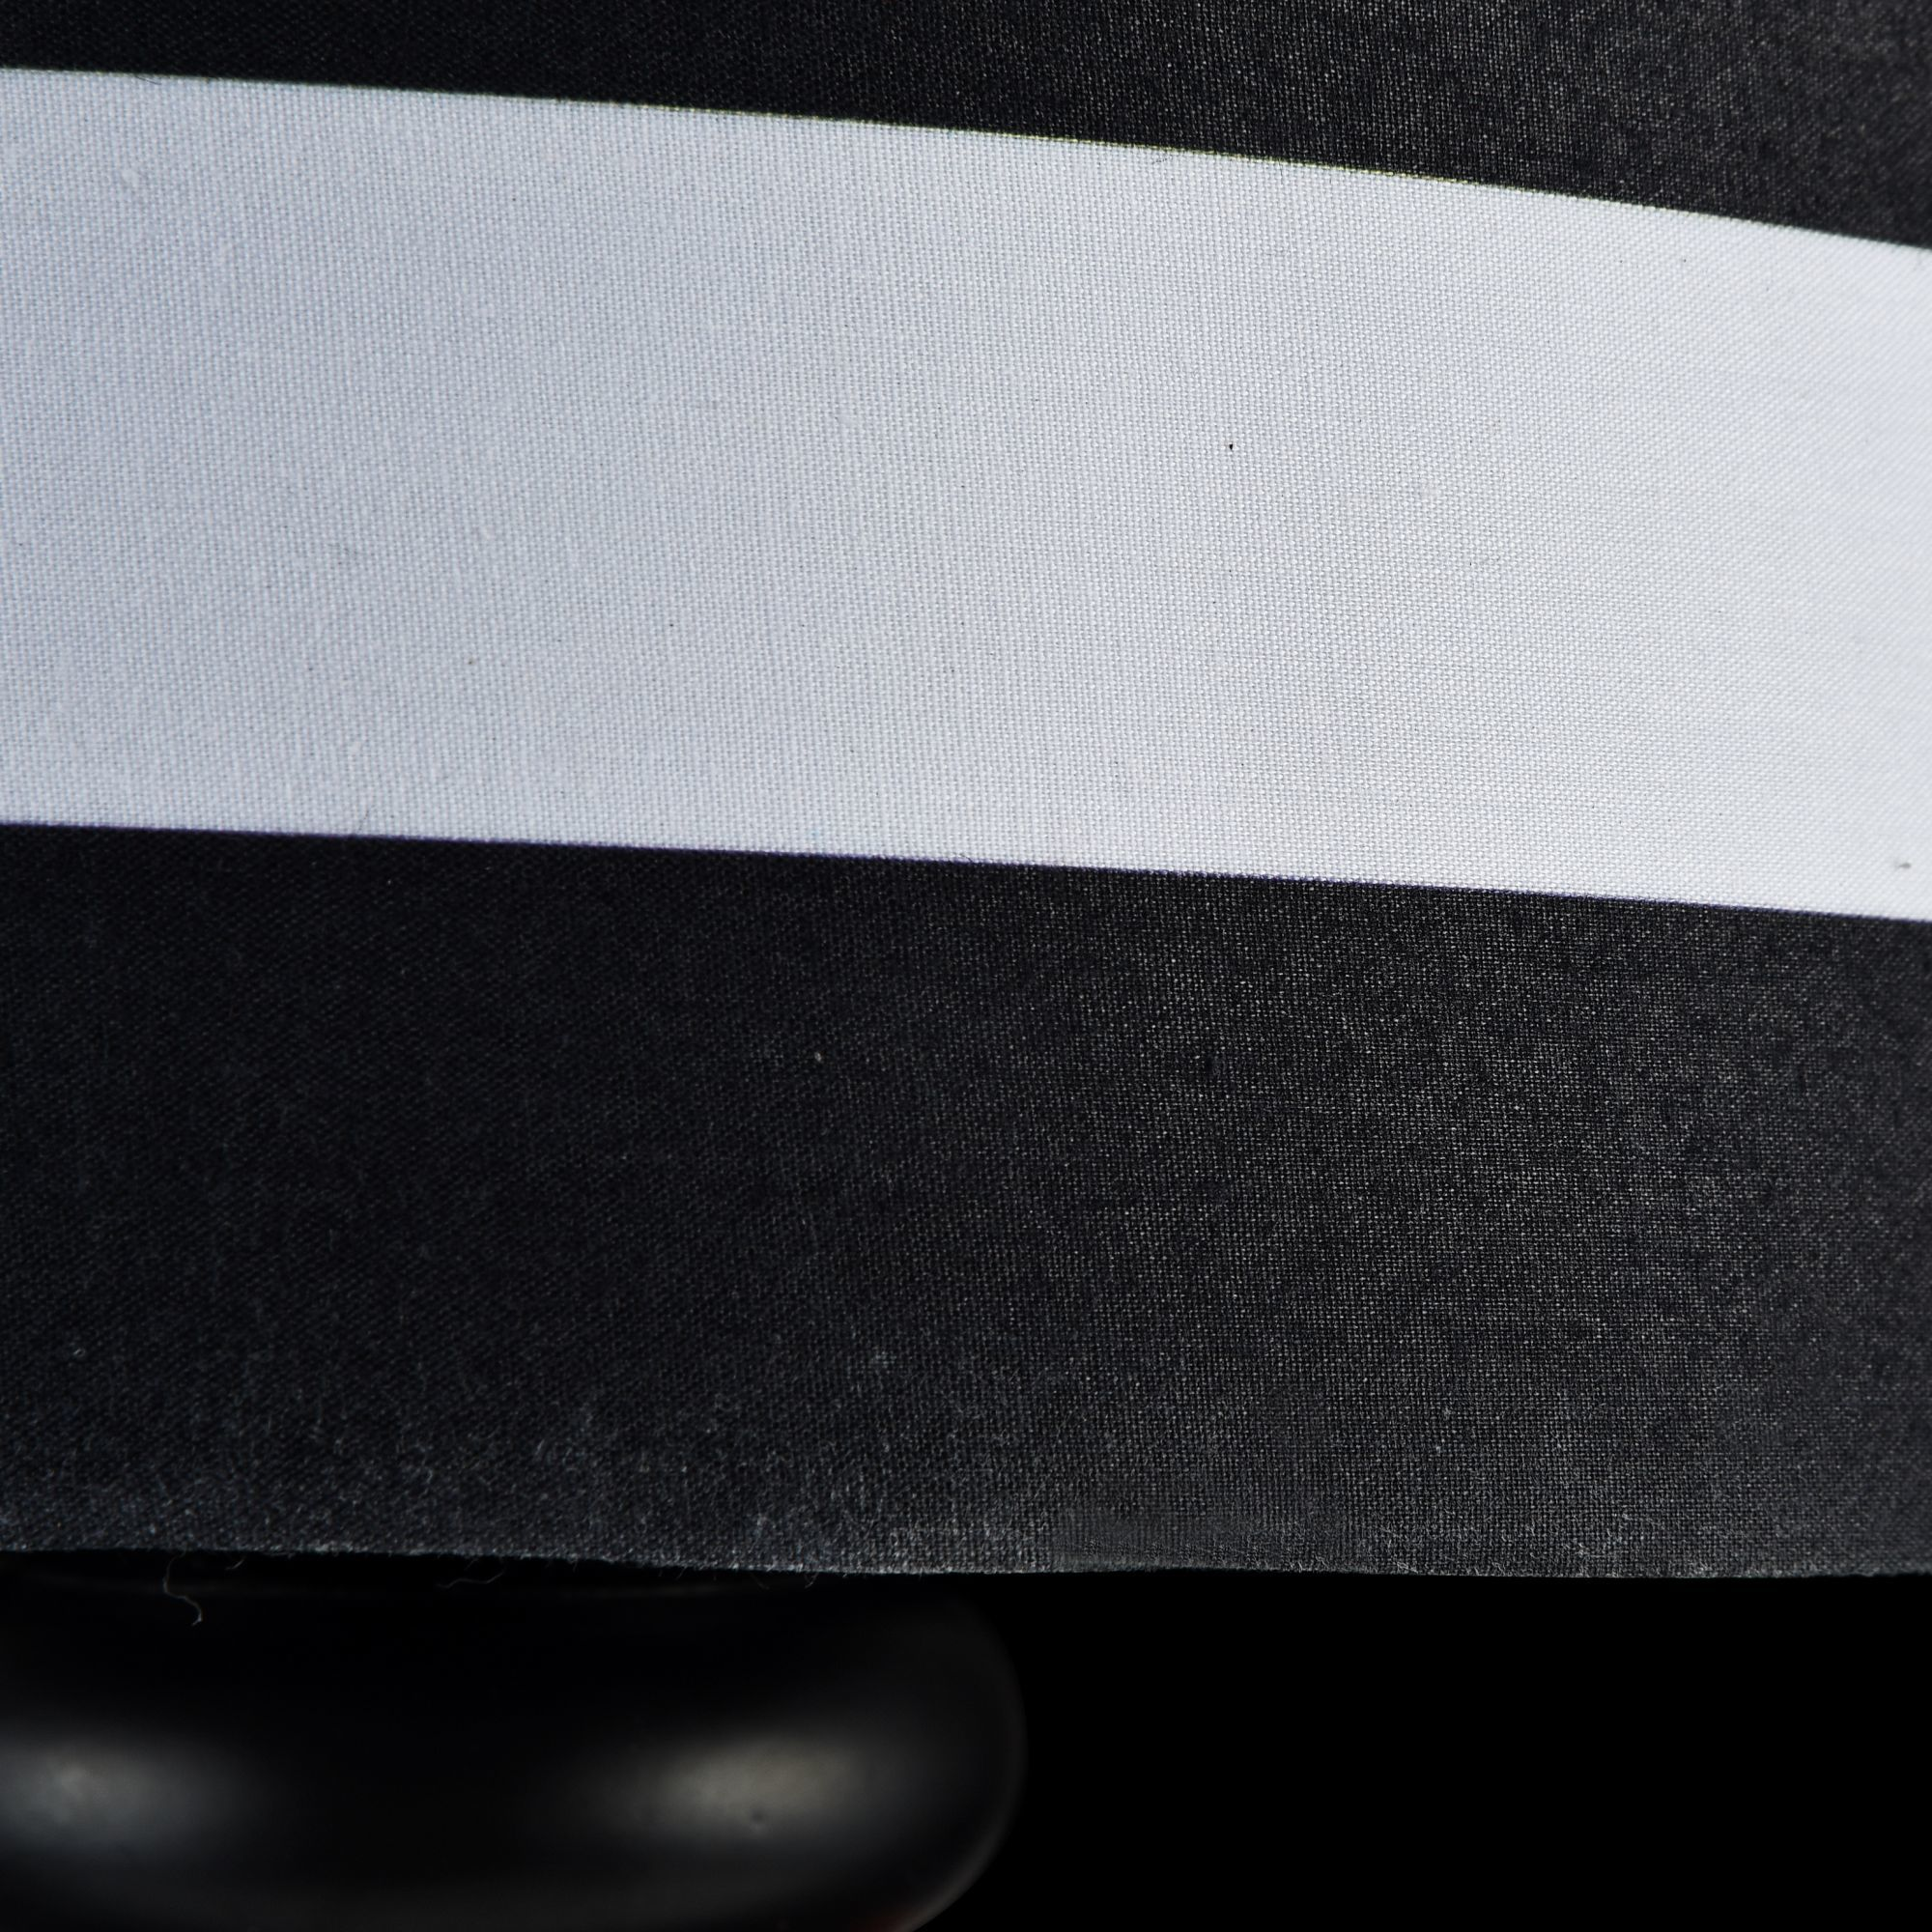 Бра Maytoni Modern Sailor MOD963-WL-01-B, 1xE14x40W, черный, черно-белый, металл, текстиль - фото 6